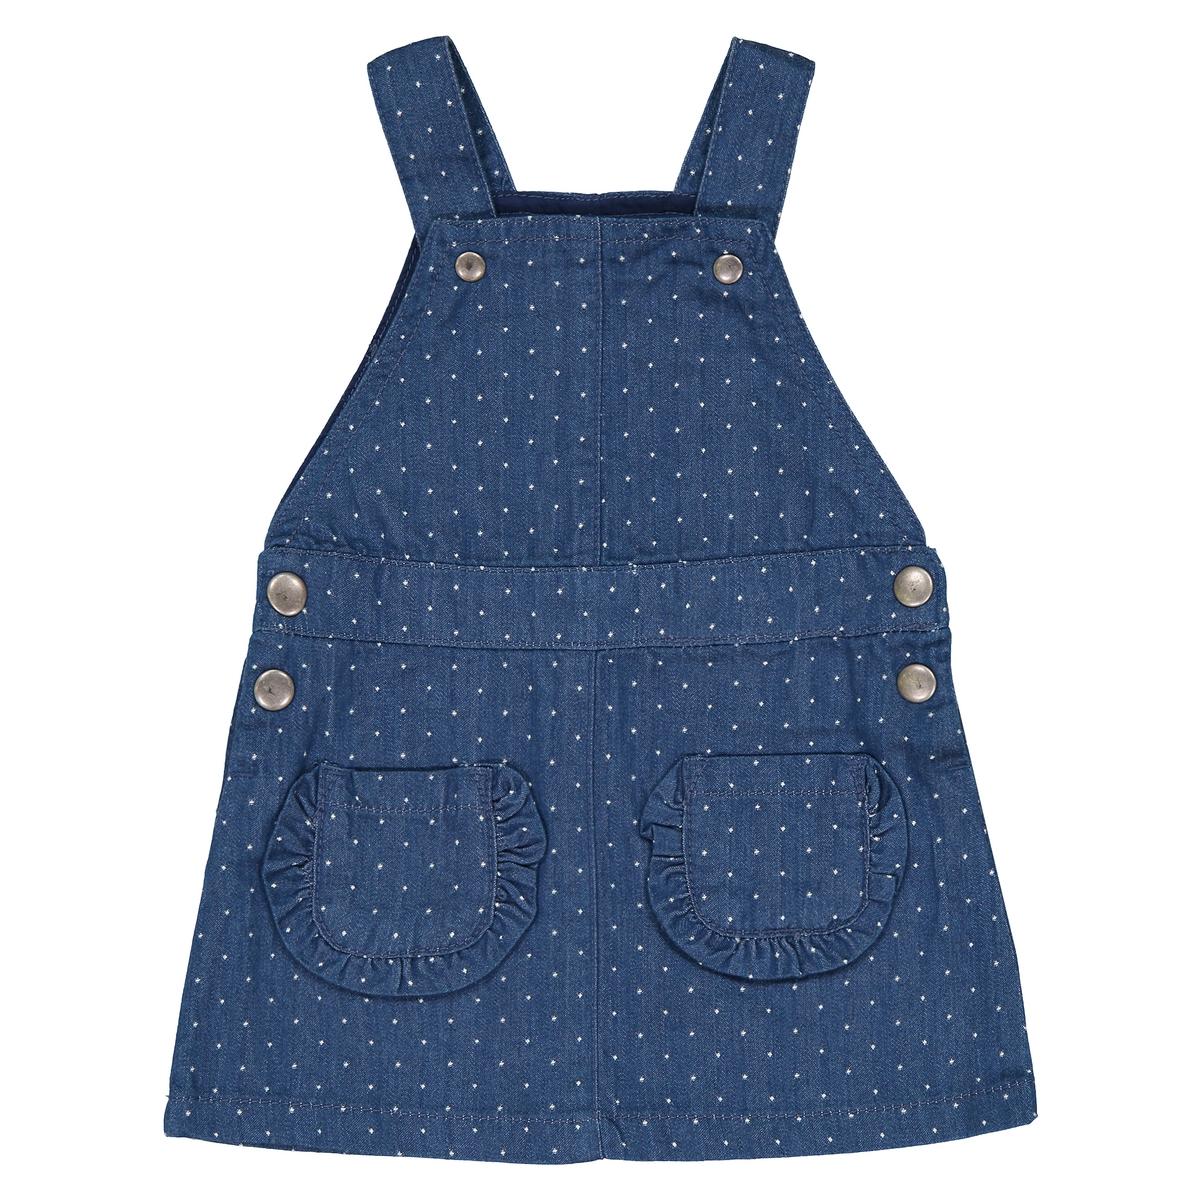 Платье-комбинезон в горошек, 1 мес. - 3 года комплект для младенца футболка комбинезон 1 мес 3 года